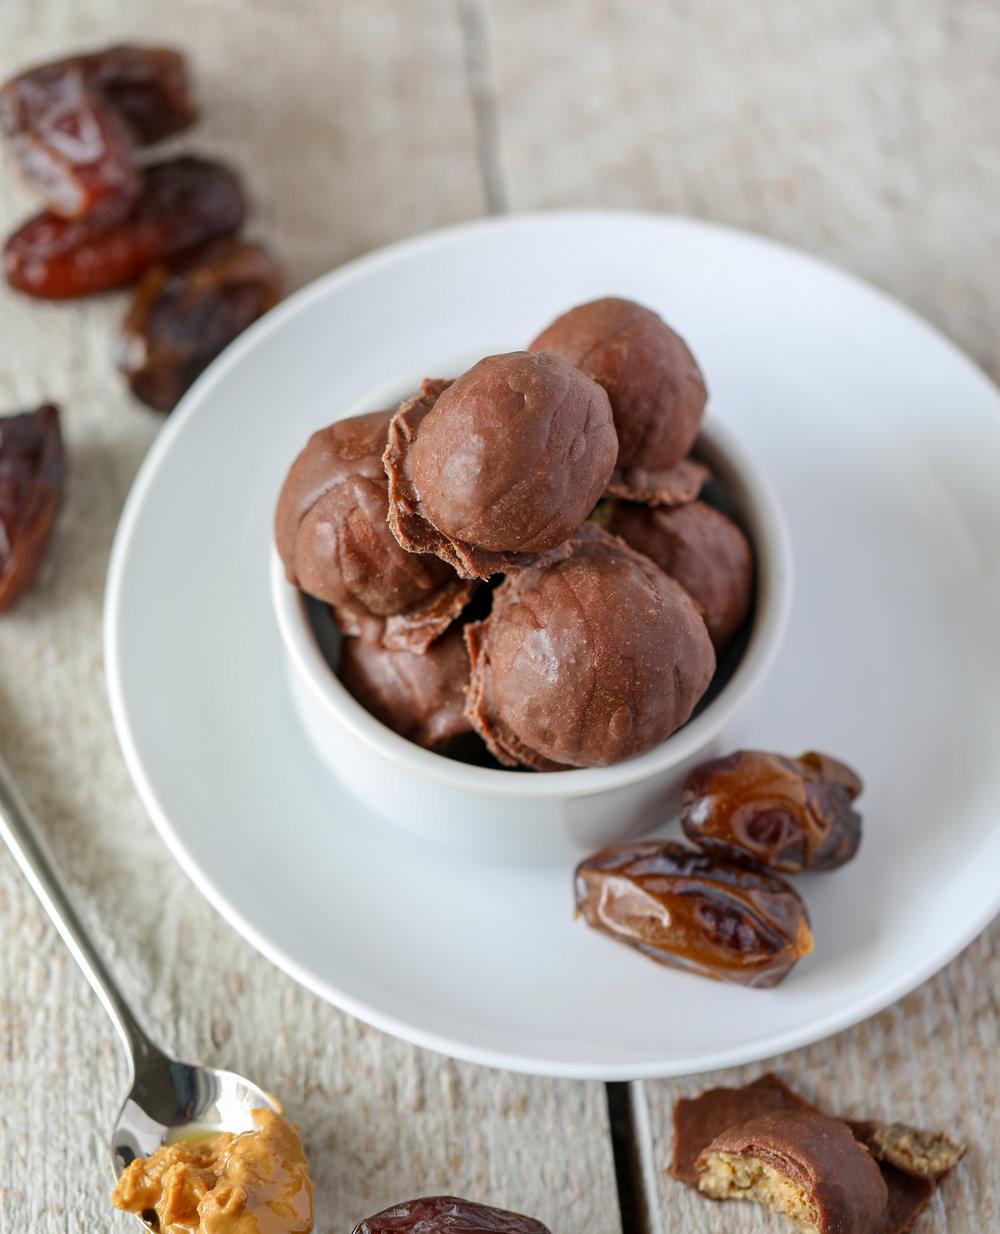 Vegan Chocolate Covered Energy Bites